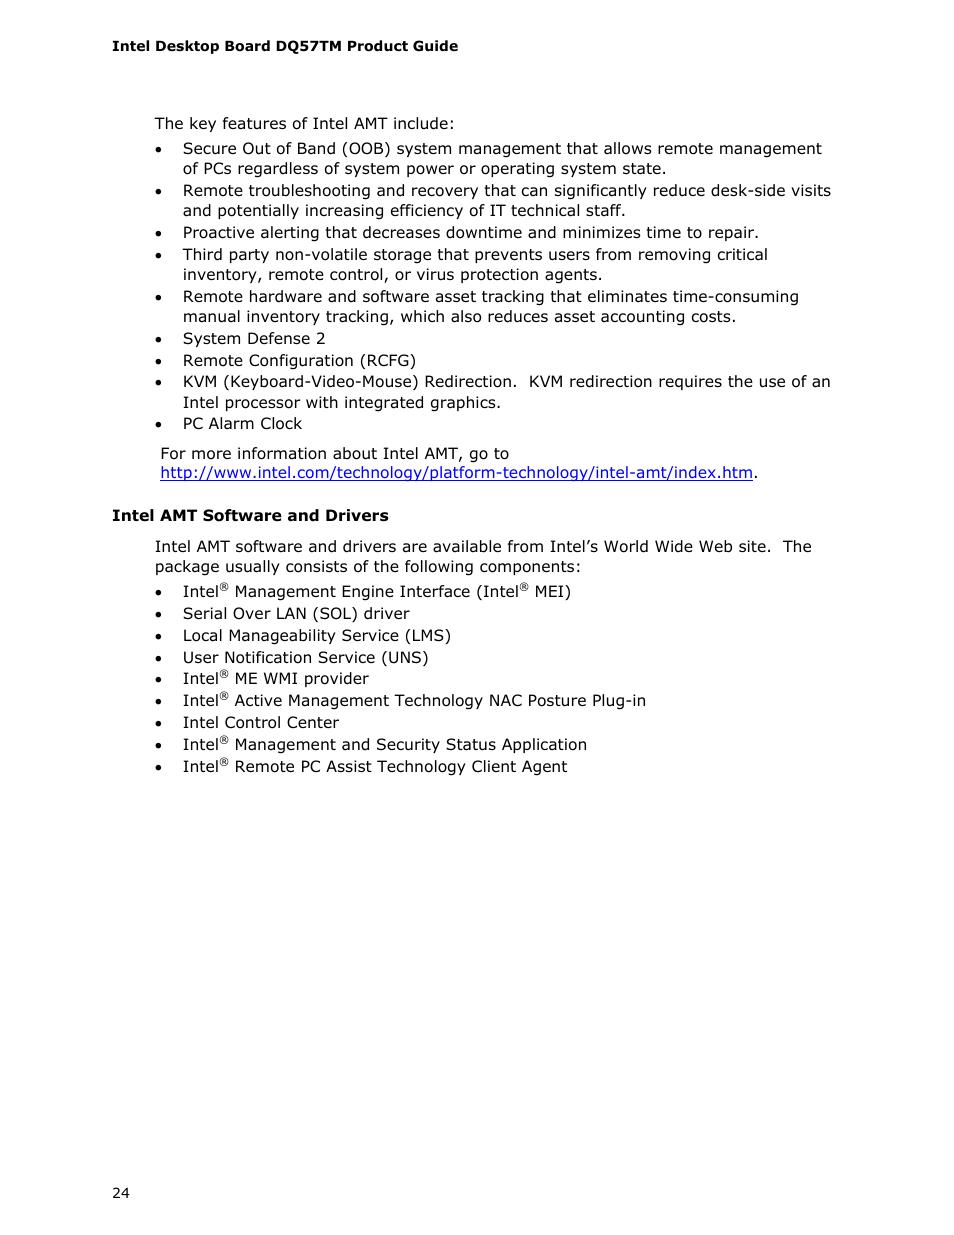 Intel DQ57TM User Manual | Page 24 / 88